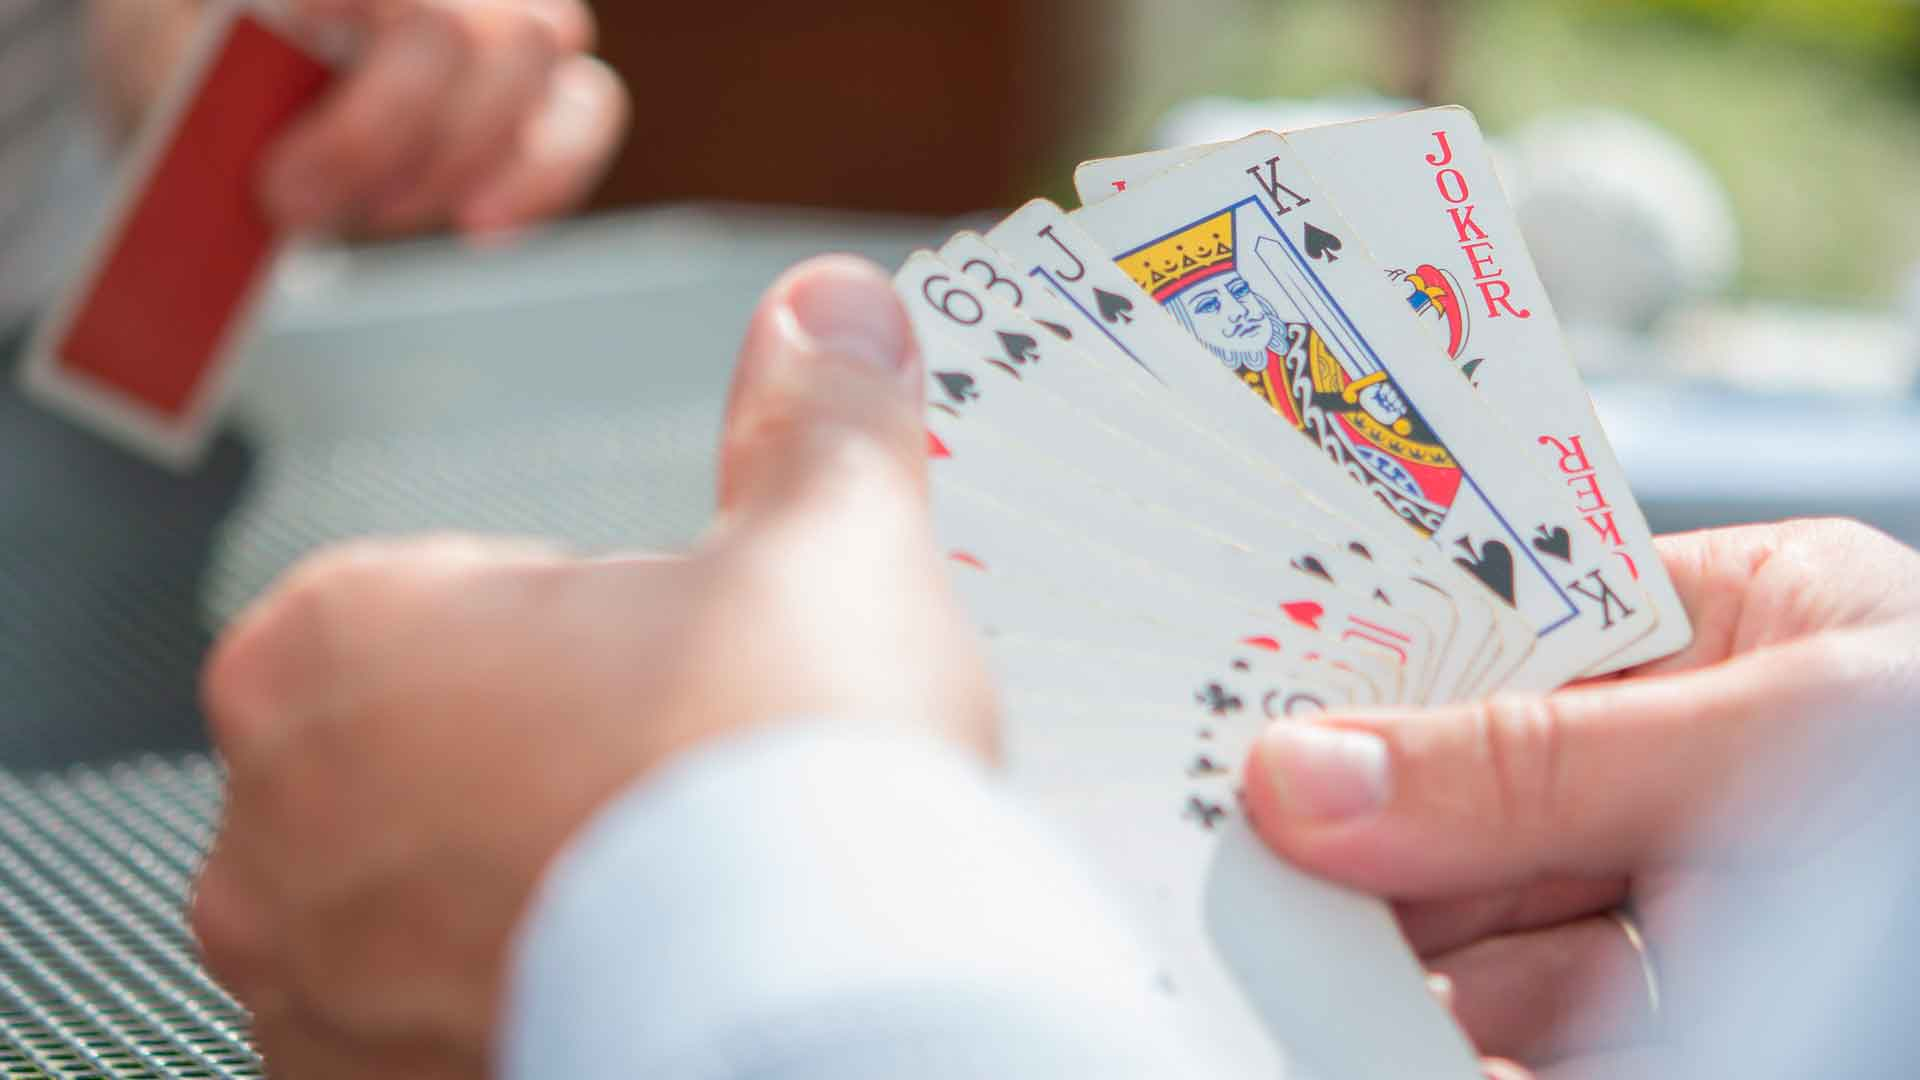 El Olimpo del póquer hero asset